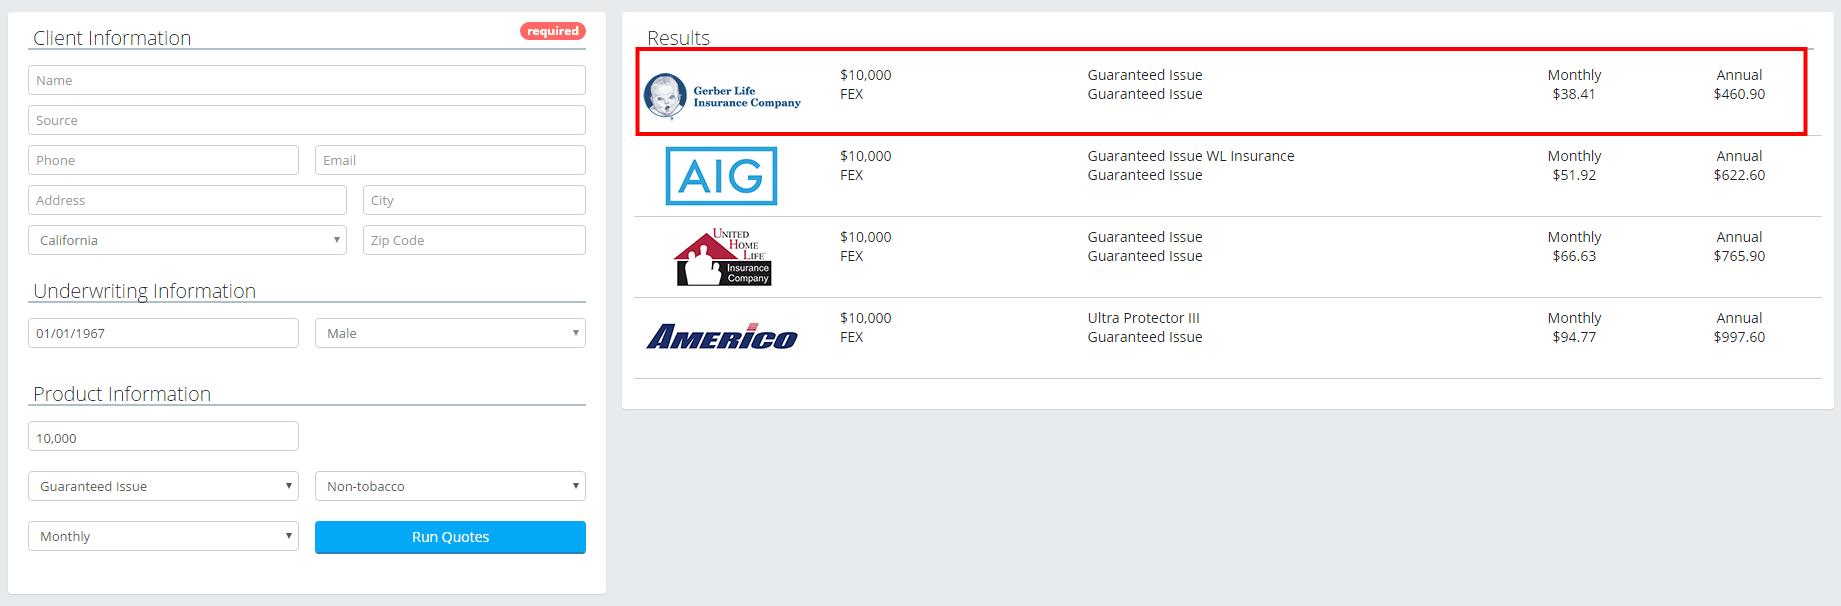 AARP life 50yrs vs others guaranteed 10k